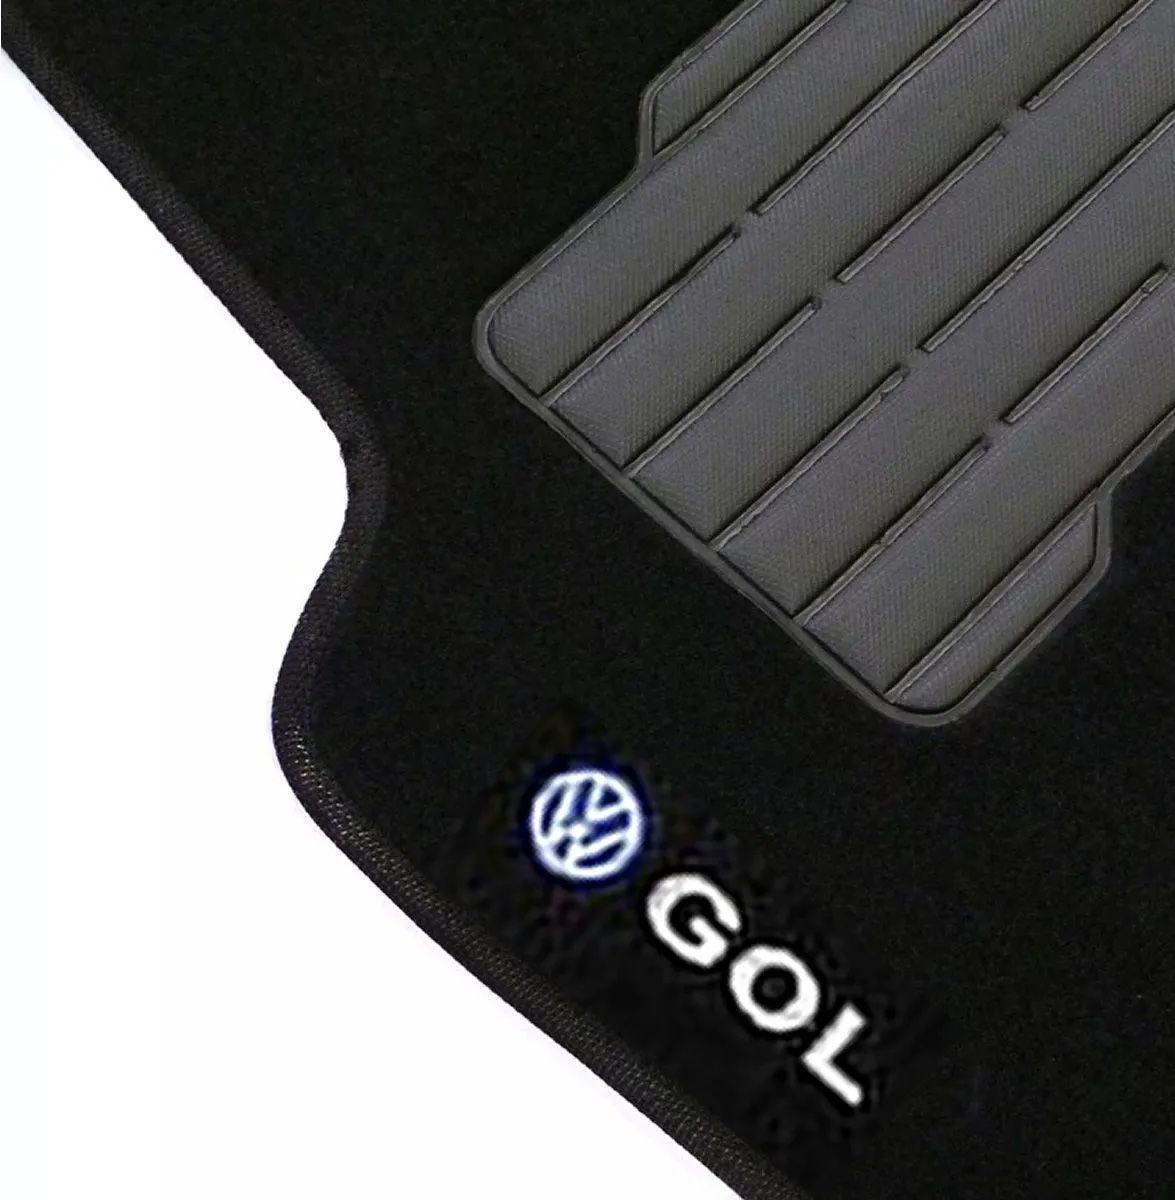 Tapete Carpete Volkswagen Gol G2 G3 G4 G5 Logo Bordado Preto Personalizado Poliparts